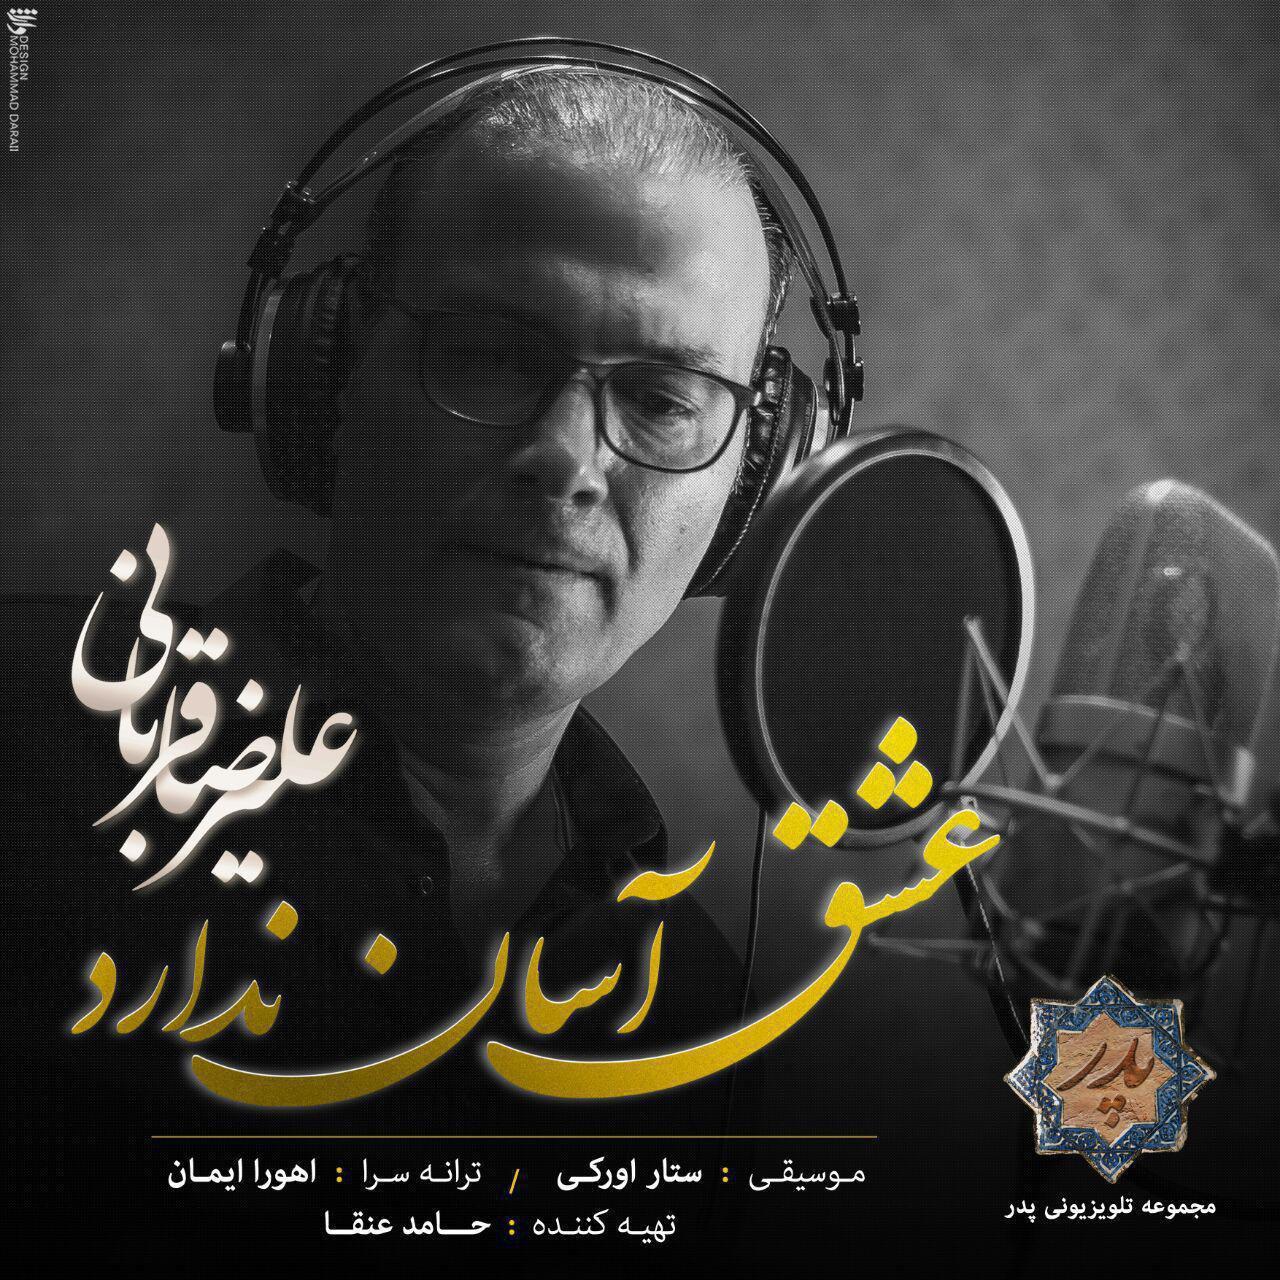 Alireza Ghorbani – Eshgh Asan Nadarad